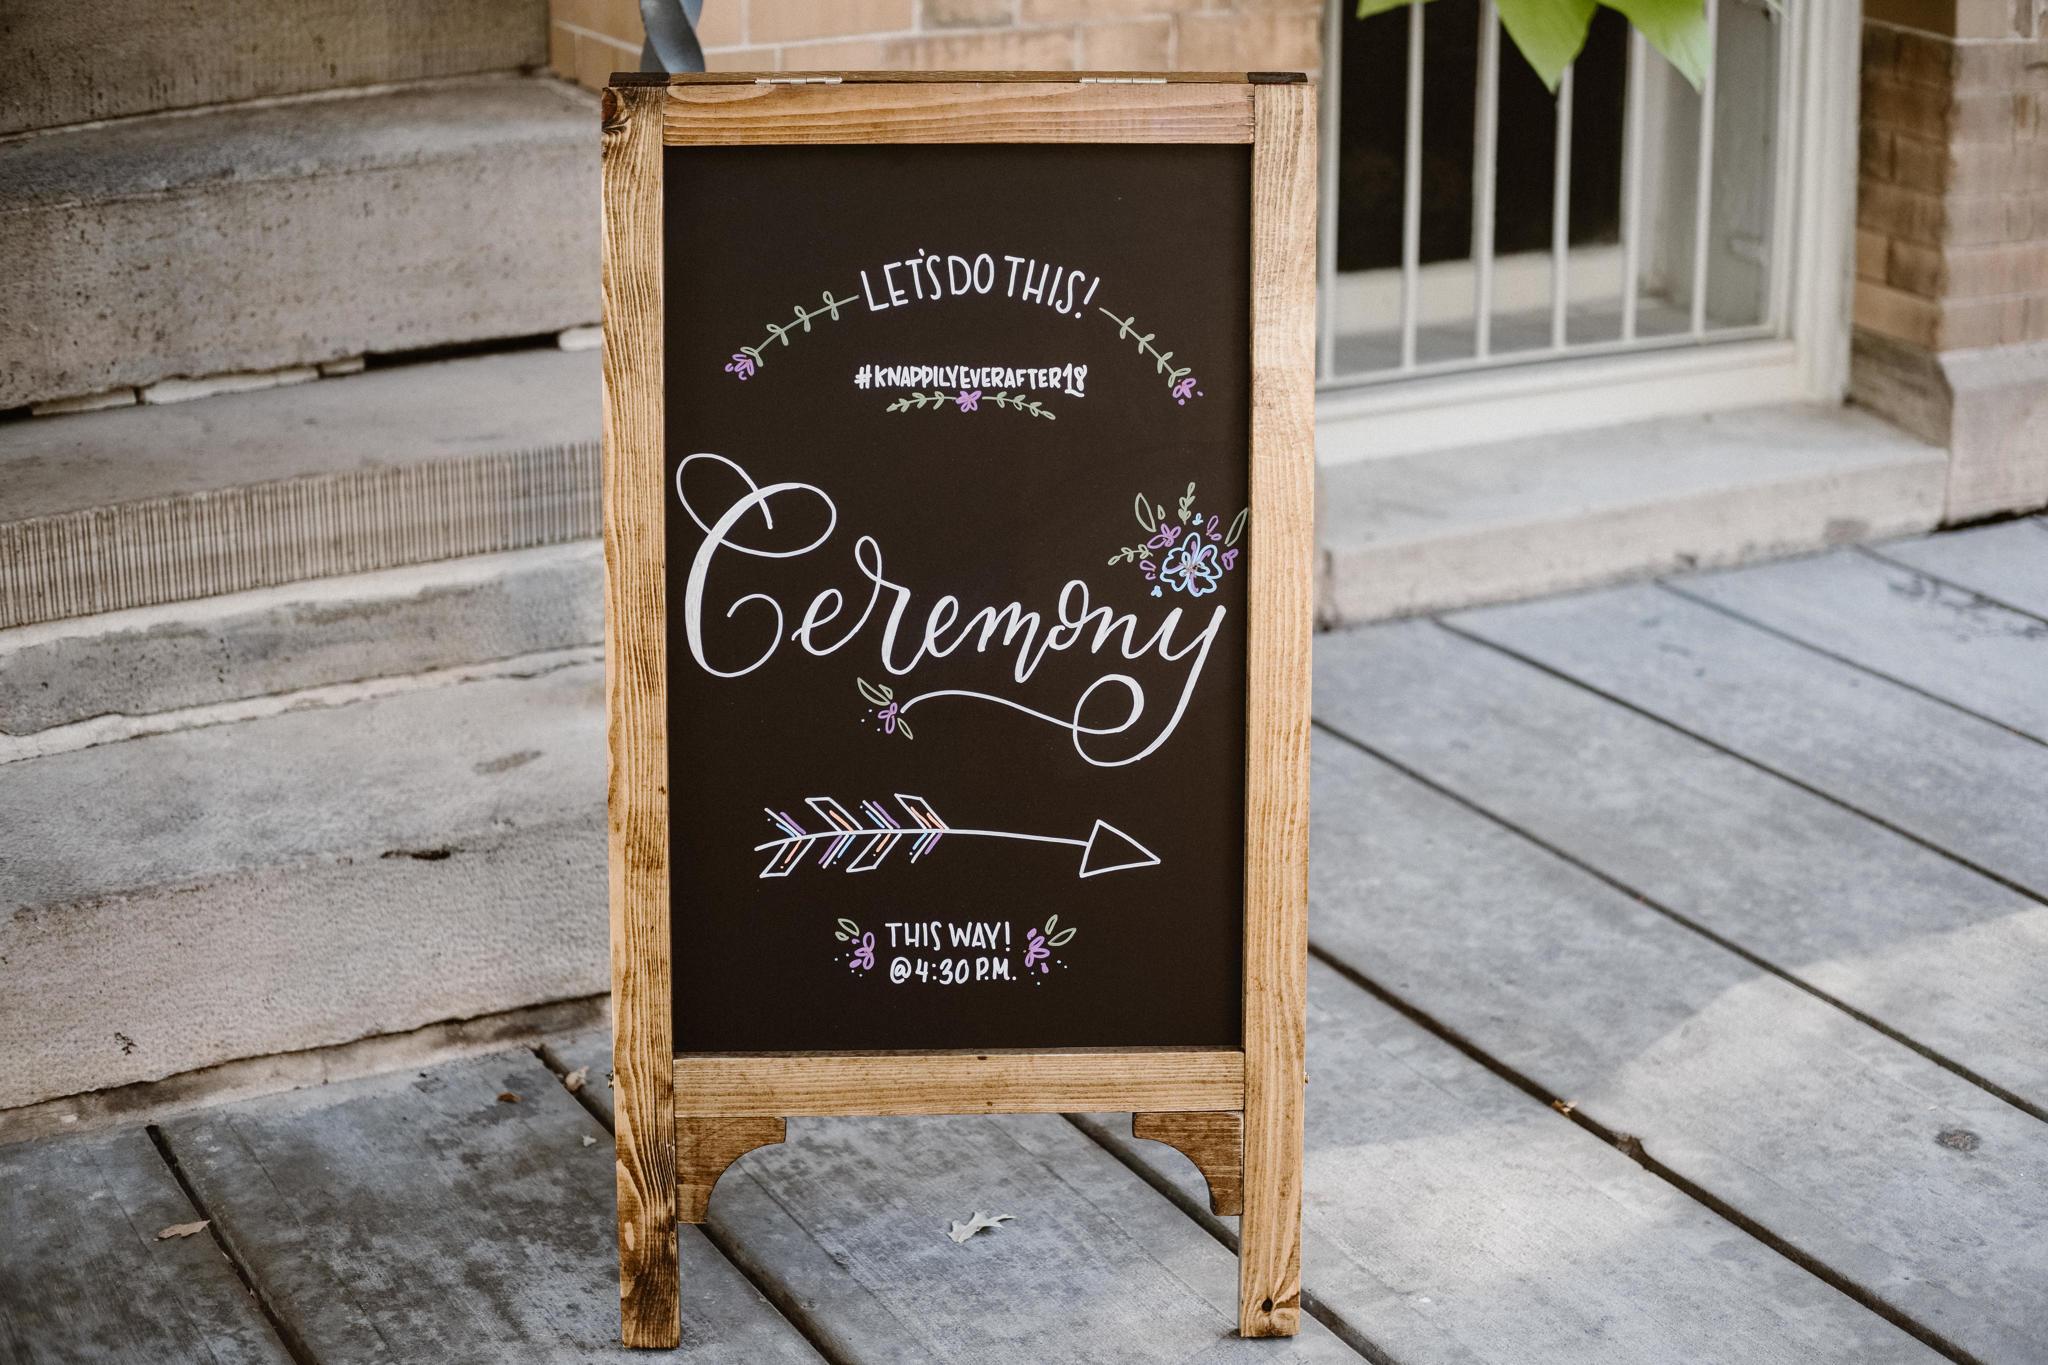 cara-jo-keith-grant-humphreys-mansion-wedding-7-21.jpg